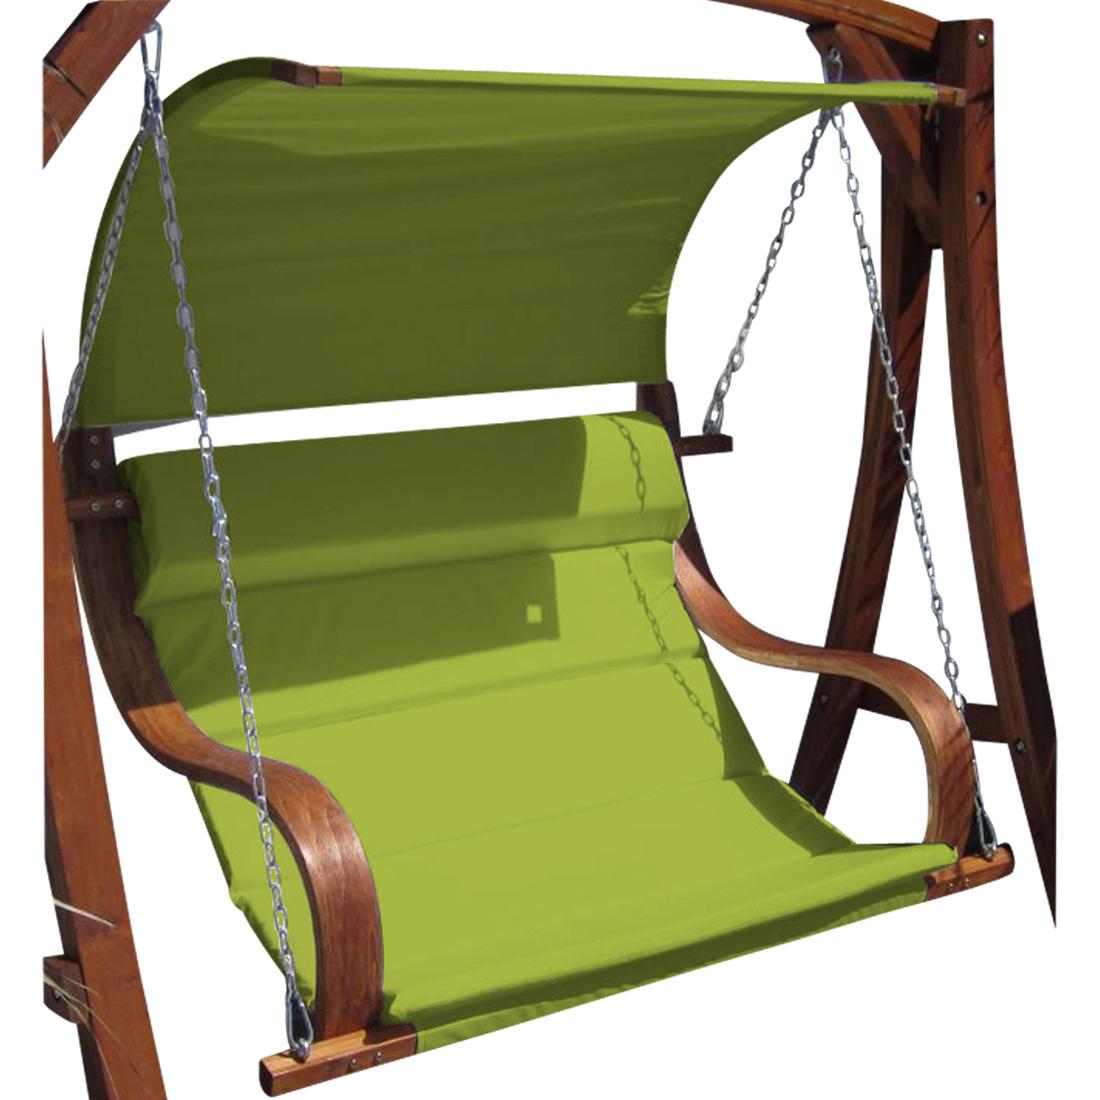 design sitzbank fur hollywoodschaukel seat meru grun aus holz larche inkl